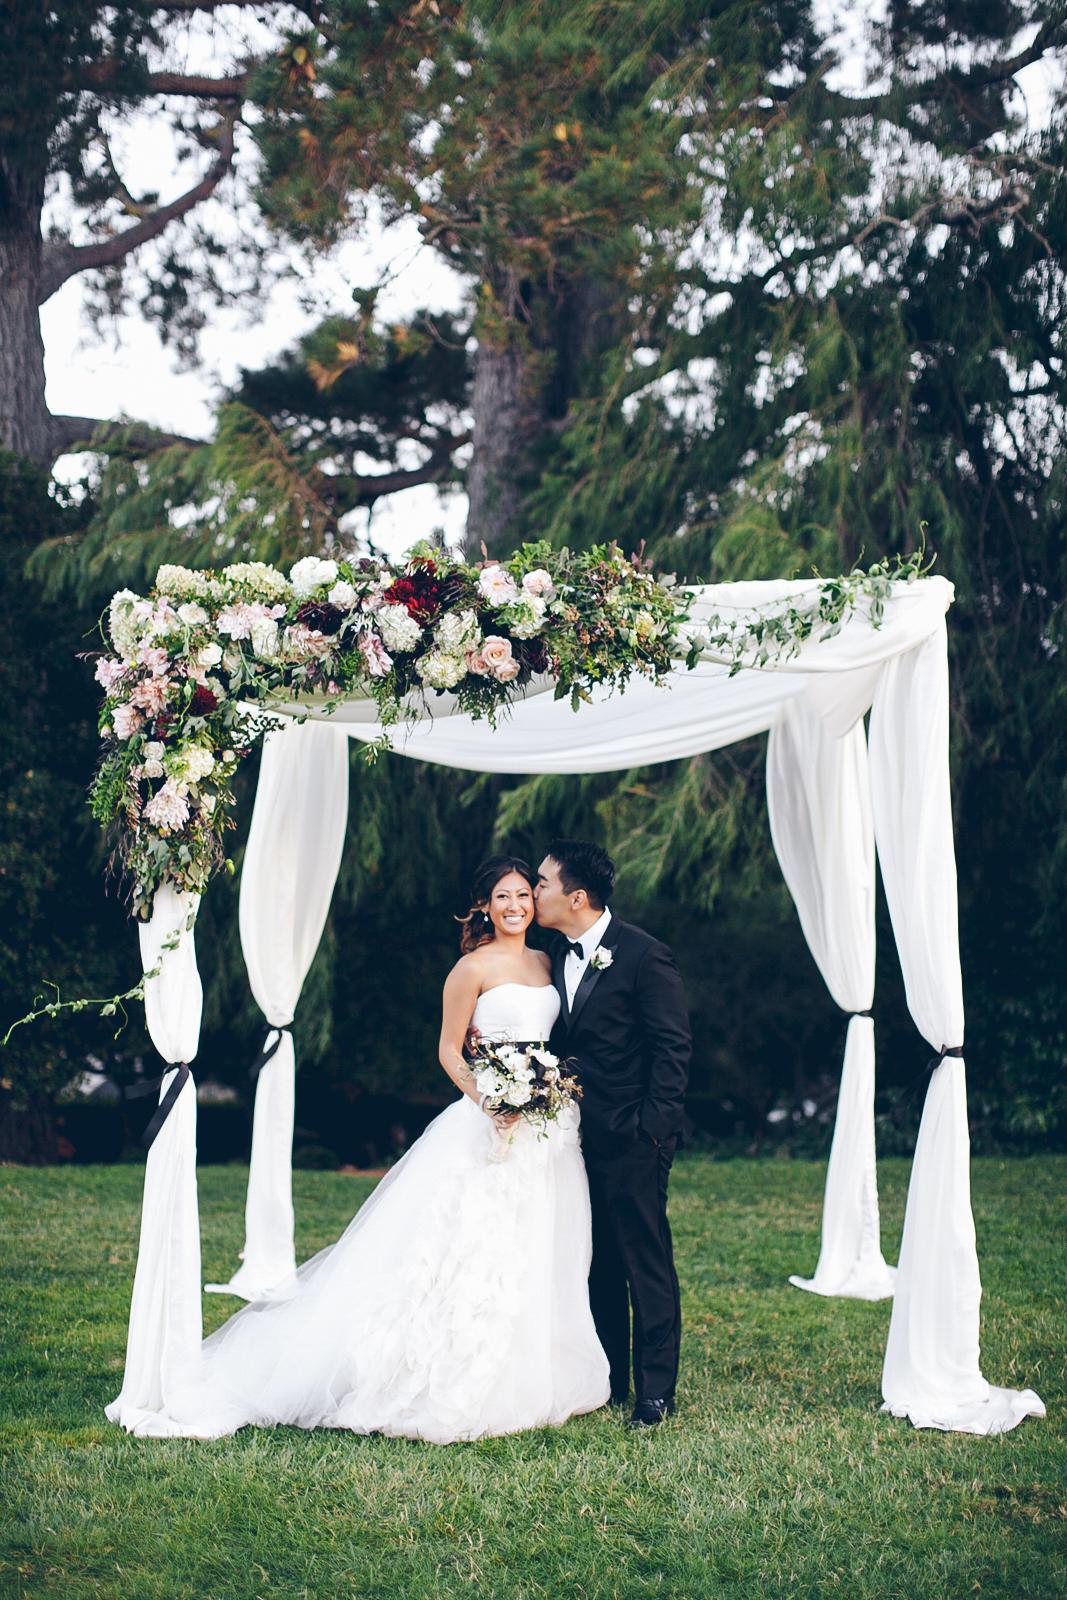 kohl_mansion_wedding_photography_samantha_gene_ebony_siovhan_bokeh_photography_058.jpg